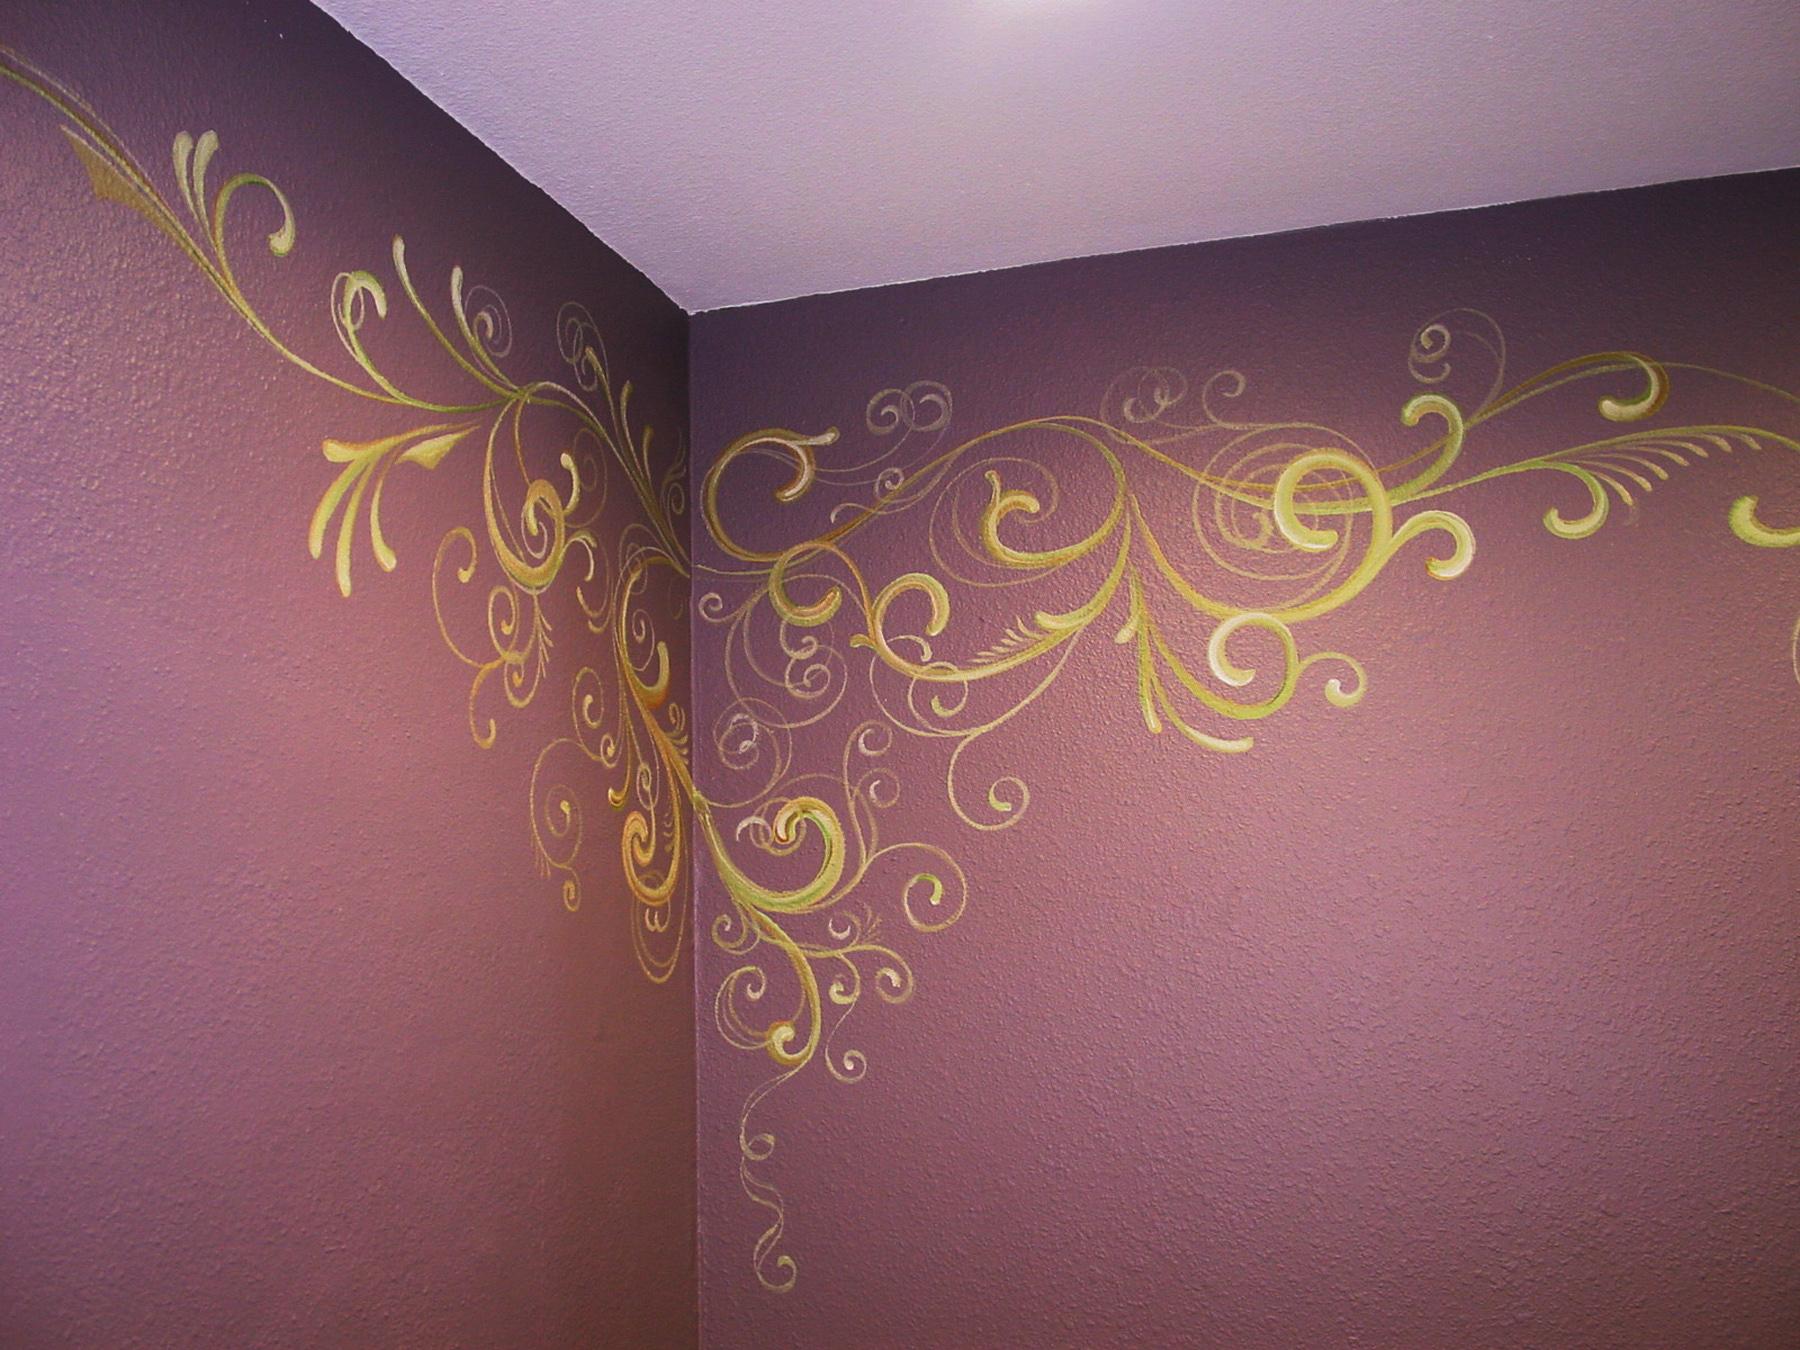 Bathroom decor � decorative painting swirly-girly | SugarmanArt